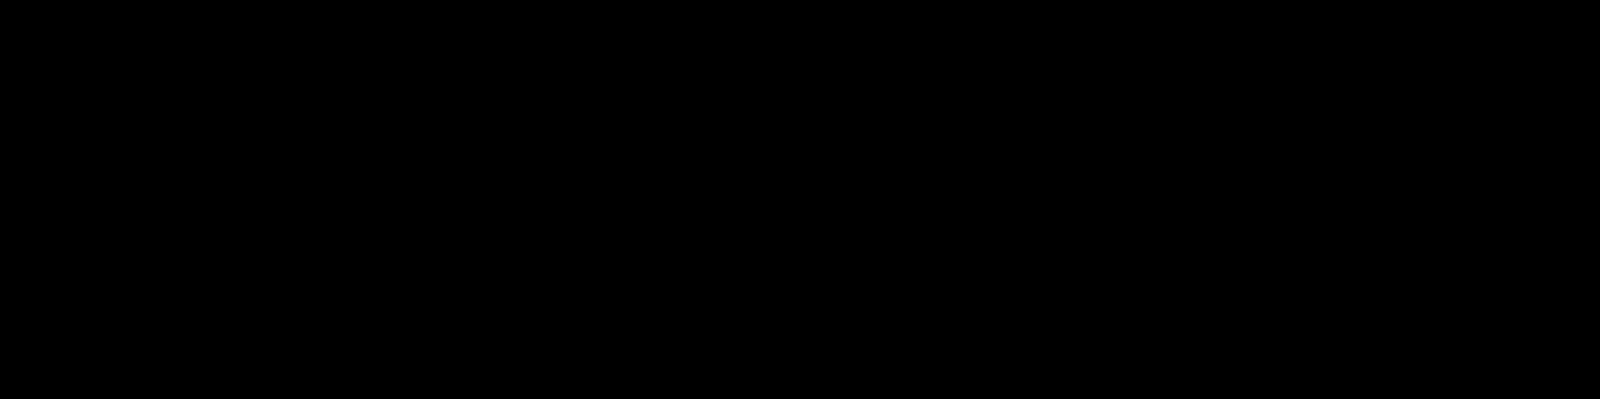 Branch SVG Clip arts